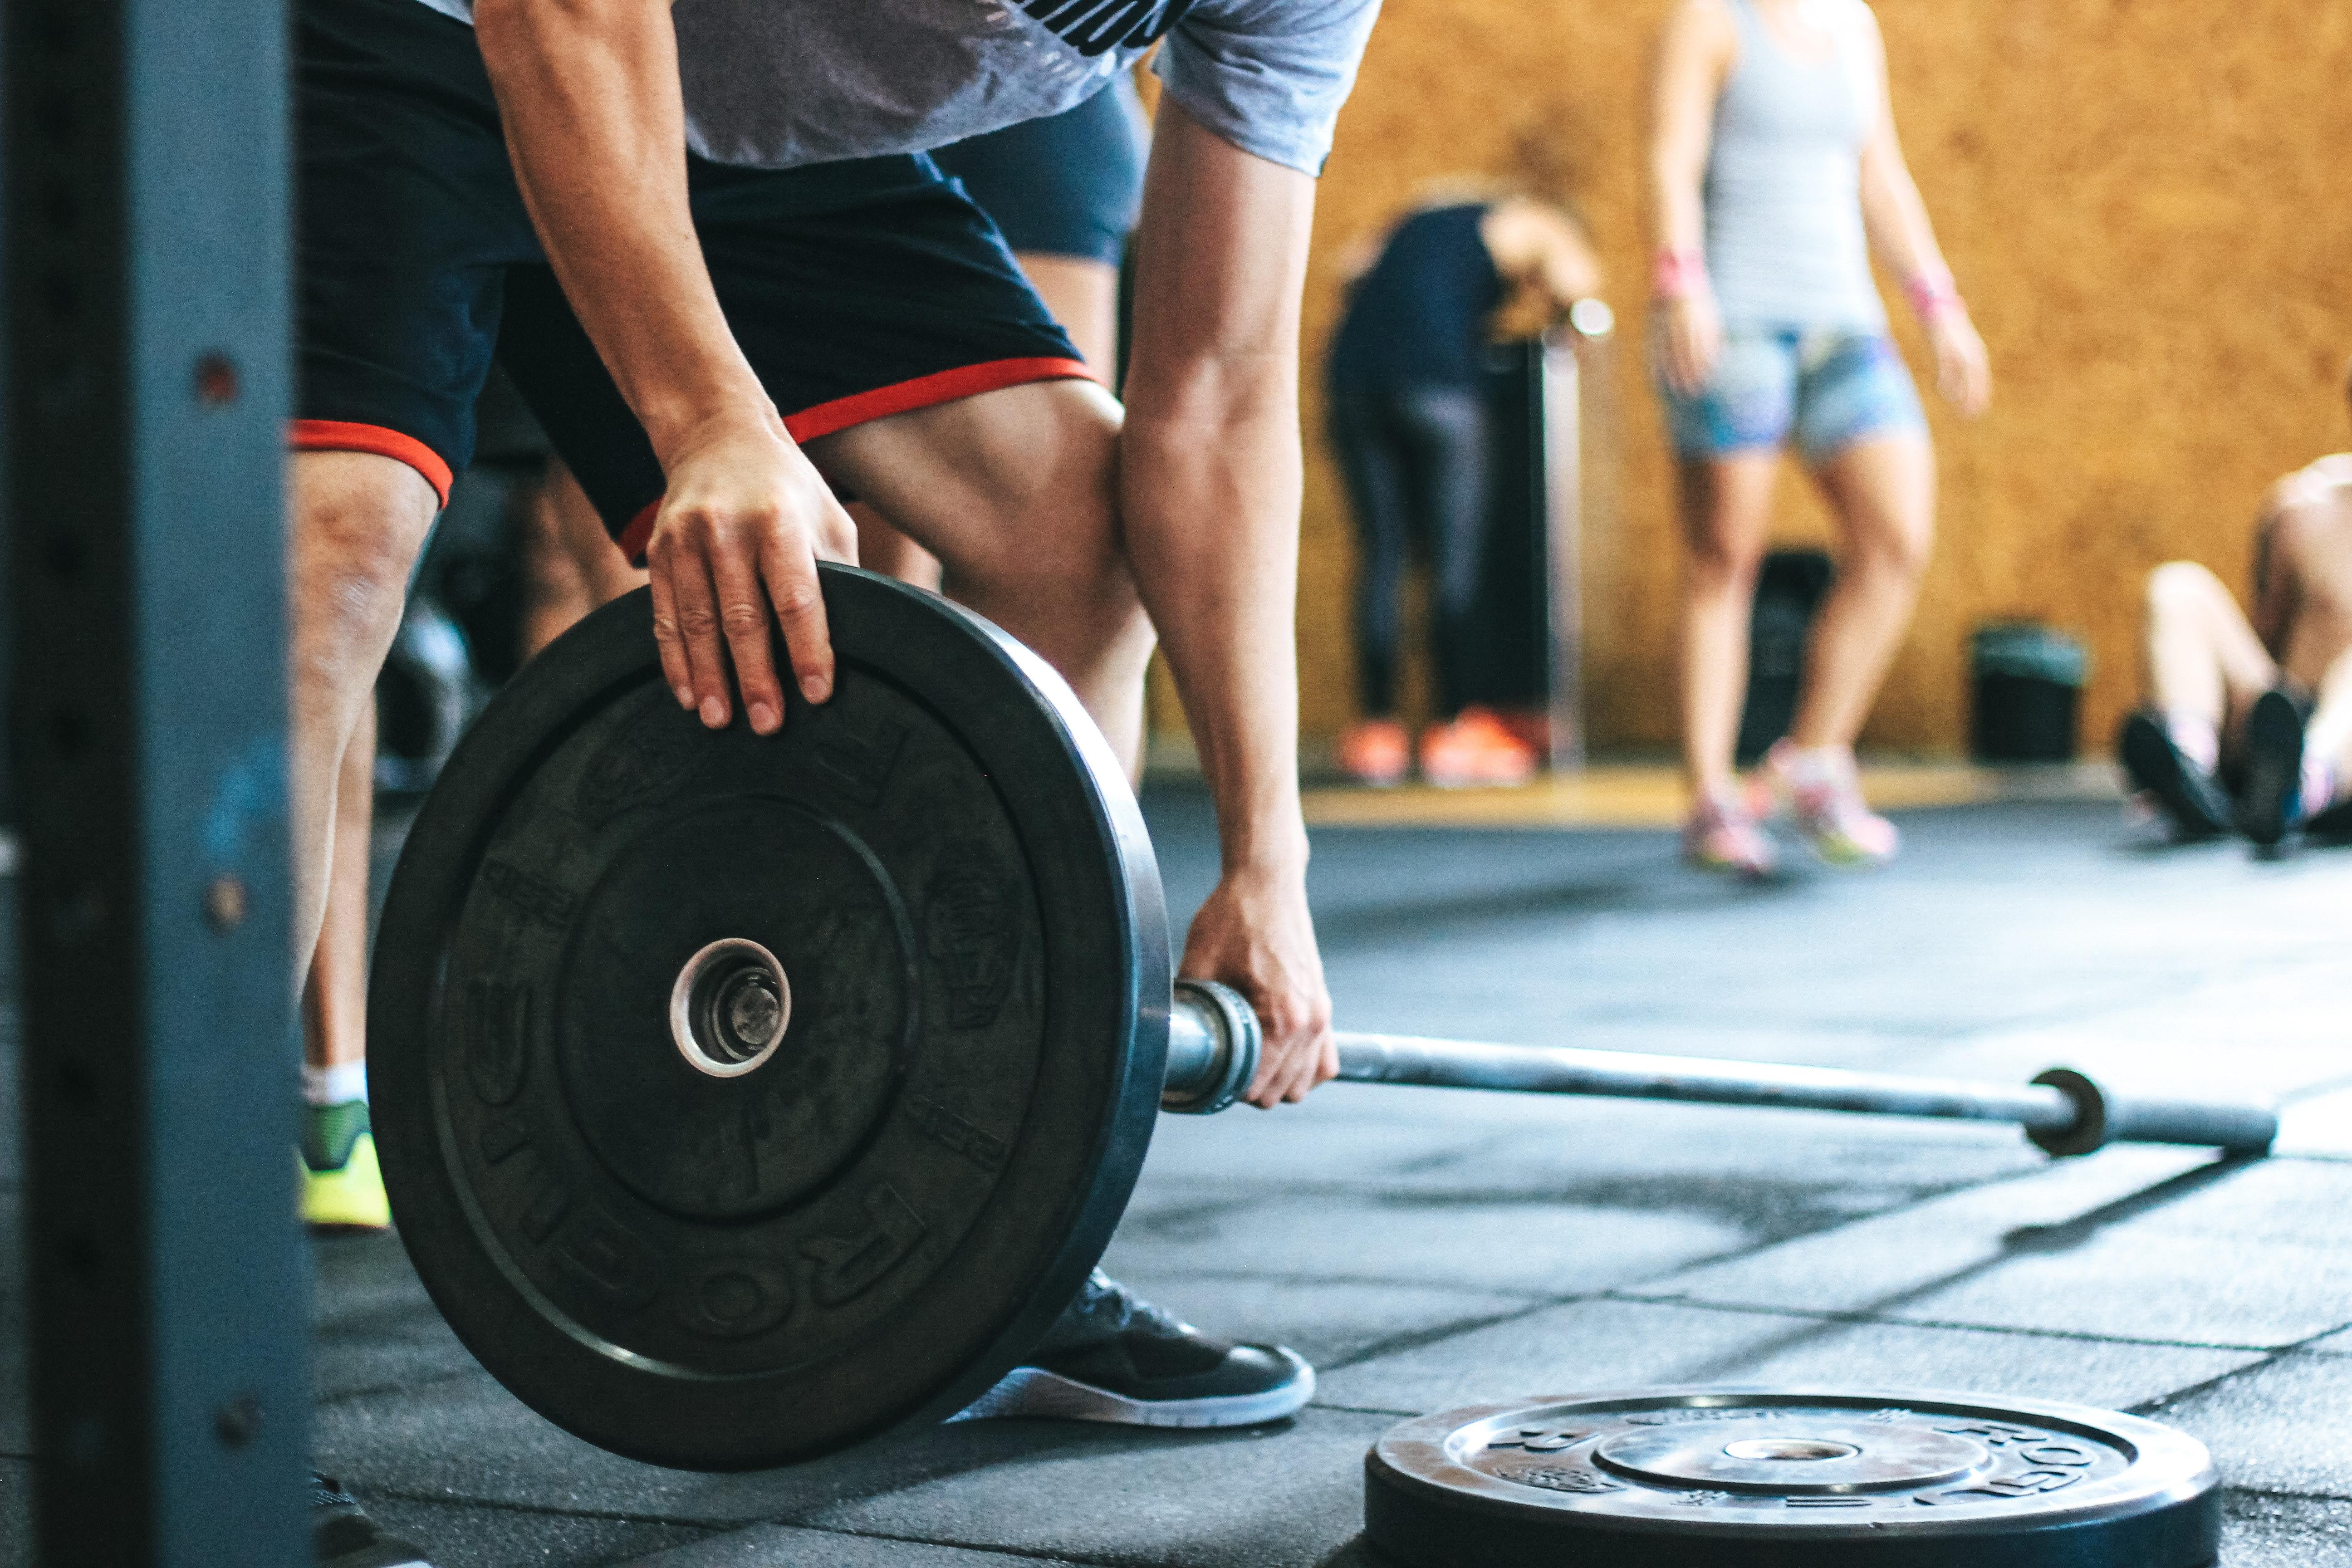 gym 24 hours